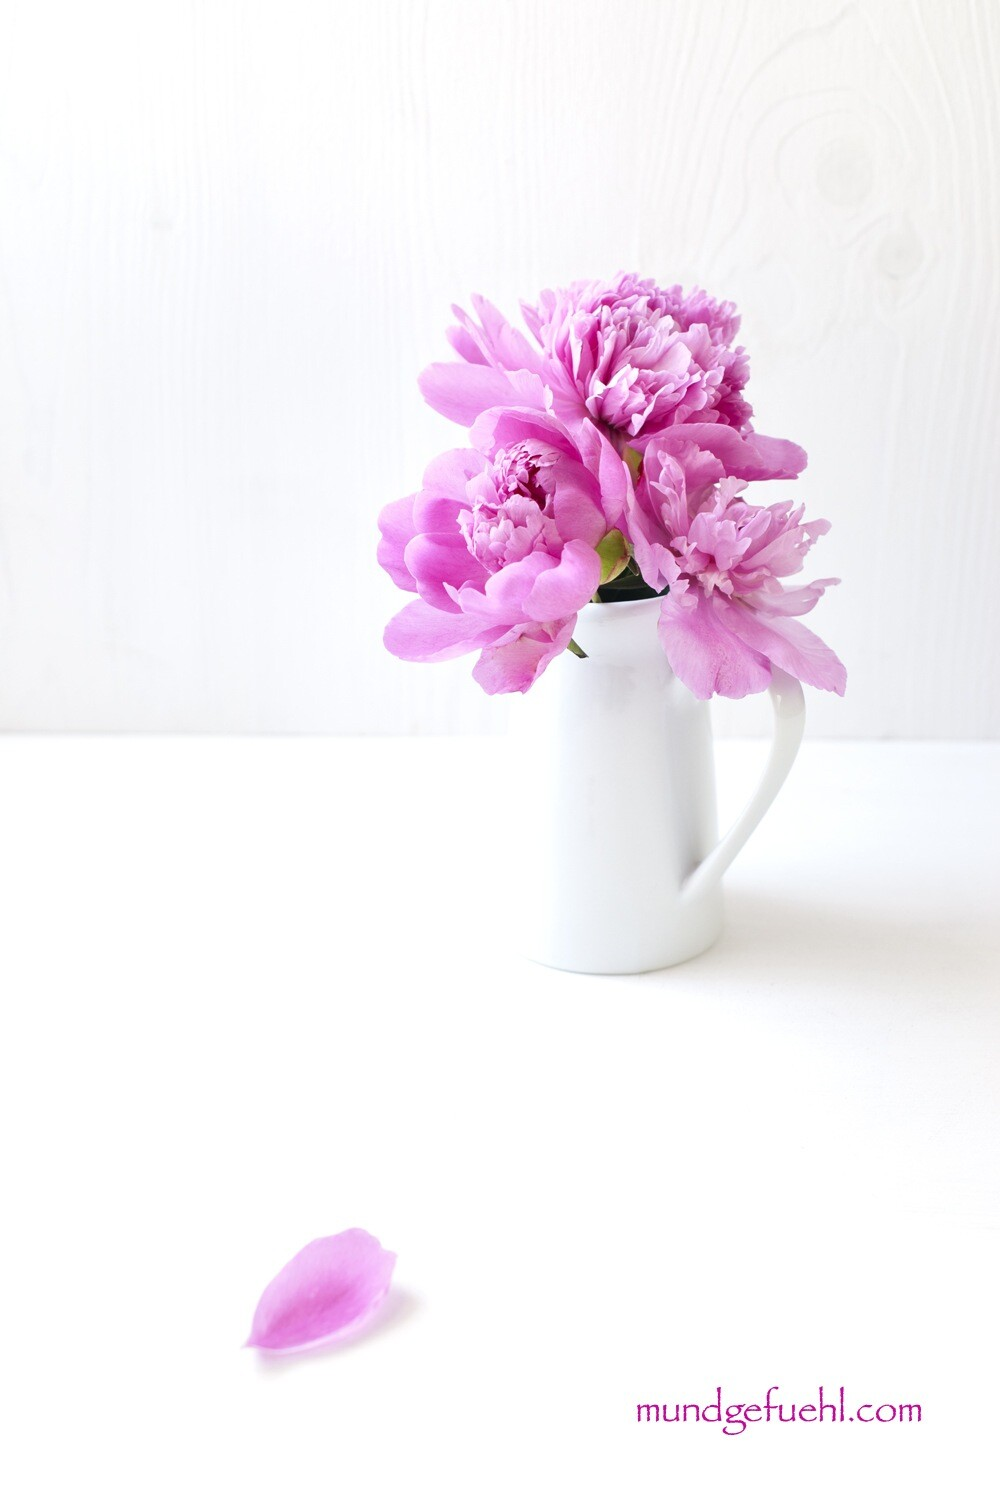 Vase mit rosa Pfingstrosen